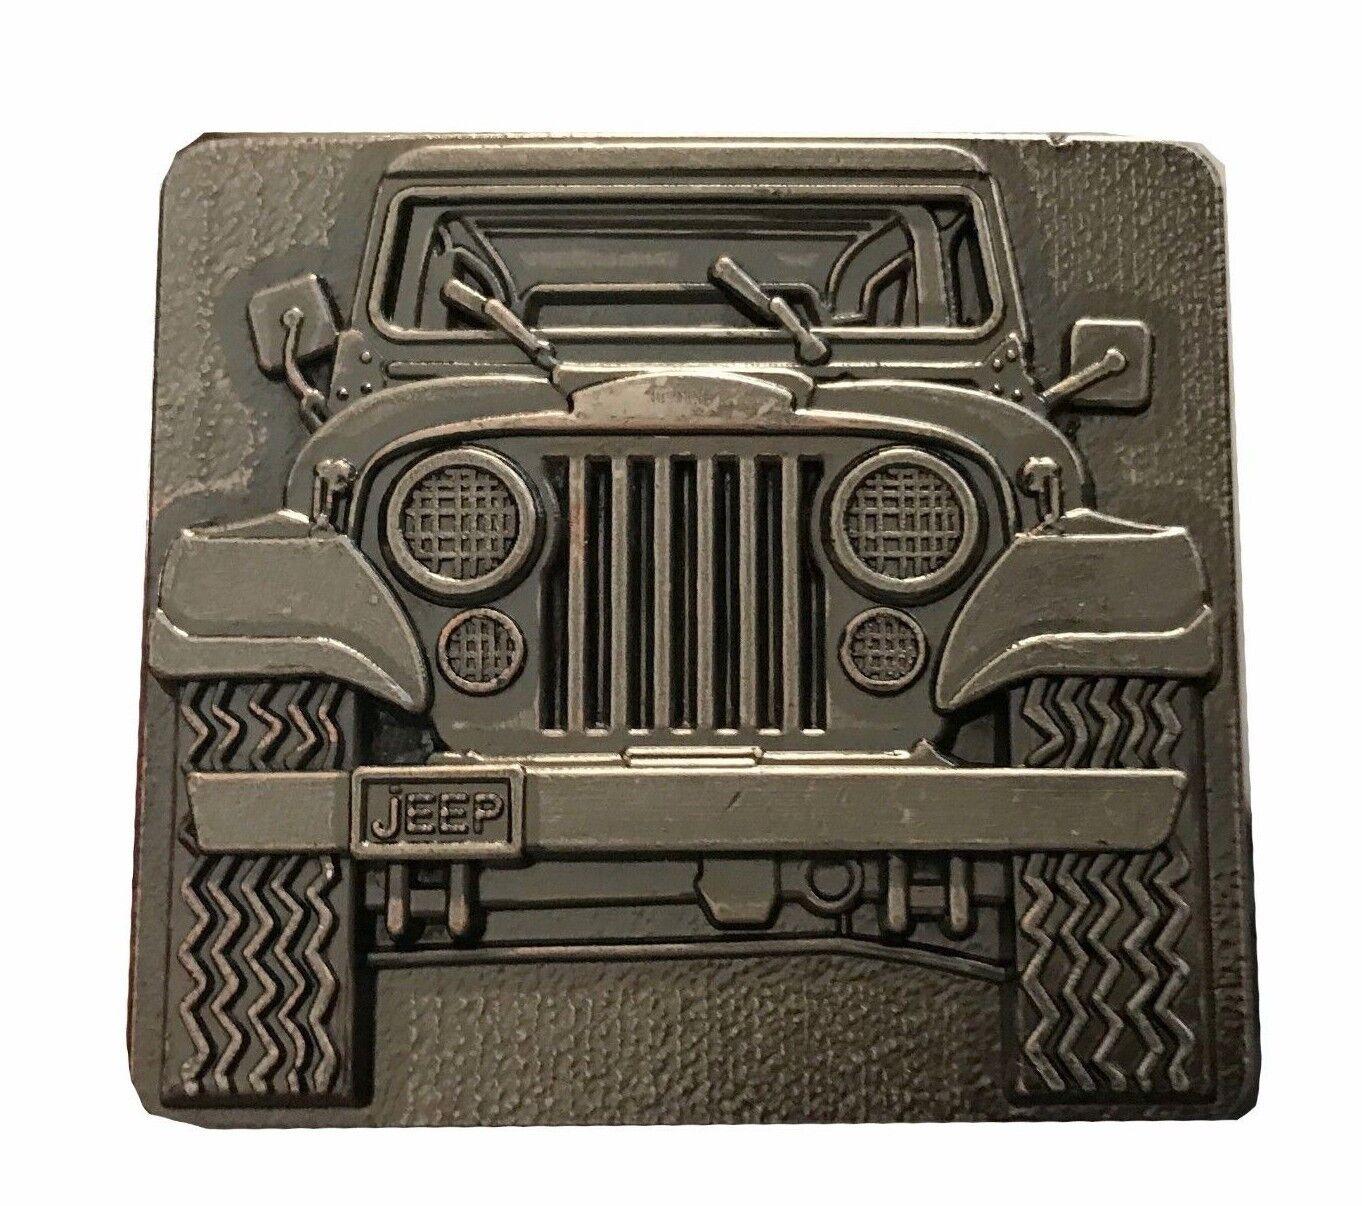 Vtg Jeep Belt Buckle Convertible Wrangler Cherokee Lover Parts Gear Gift Idea